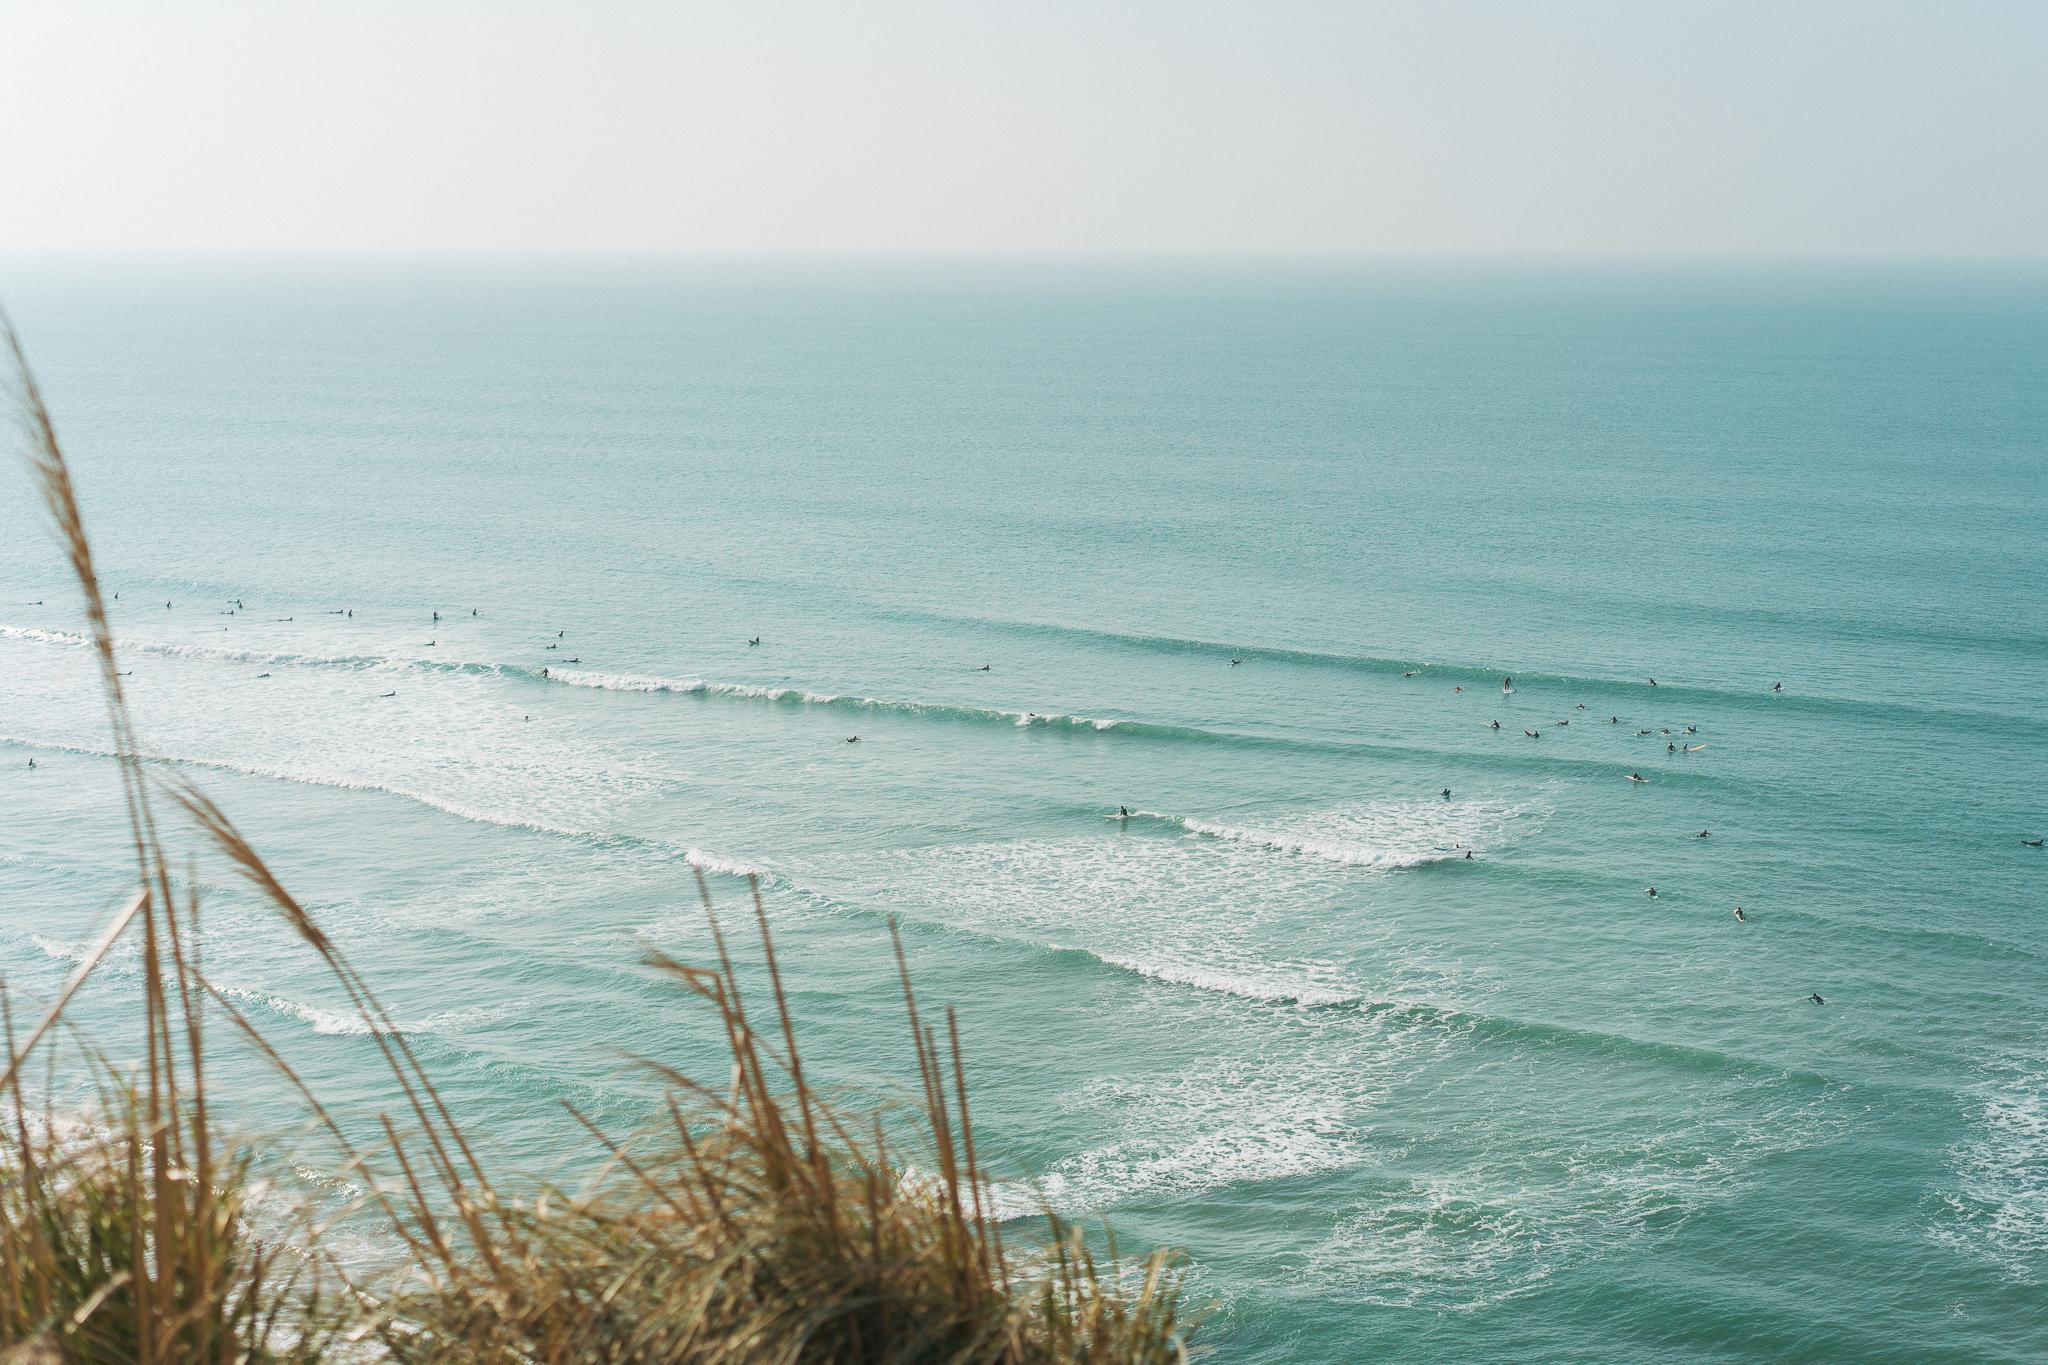 http://www.trendymood.com/wp-content/uploads/2018/05/Côte-des-Basques-Biarritz.jpg